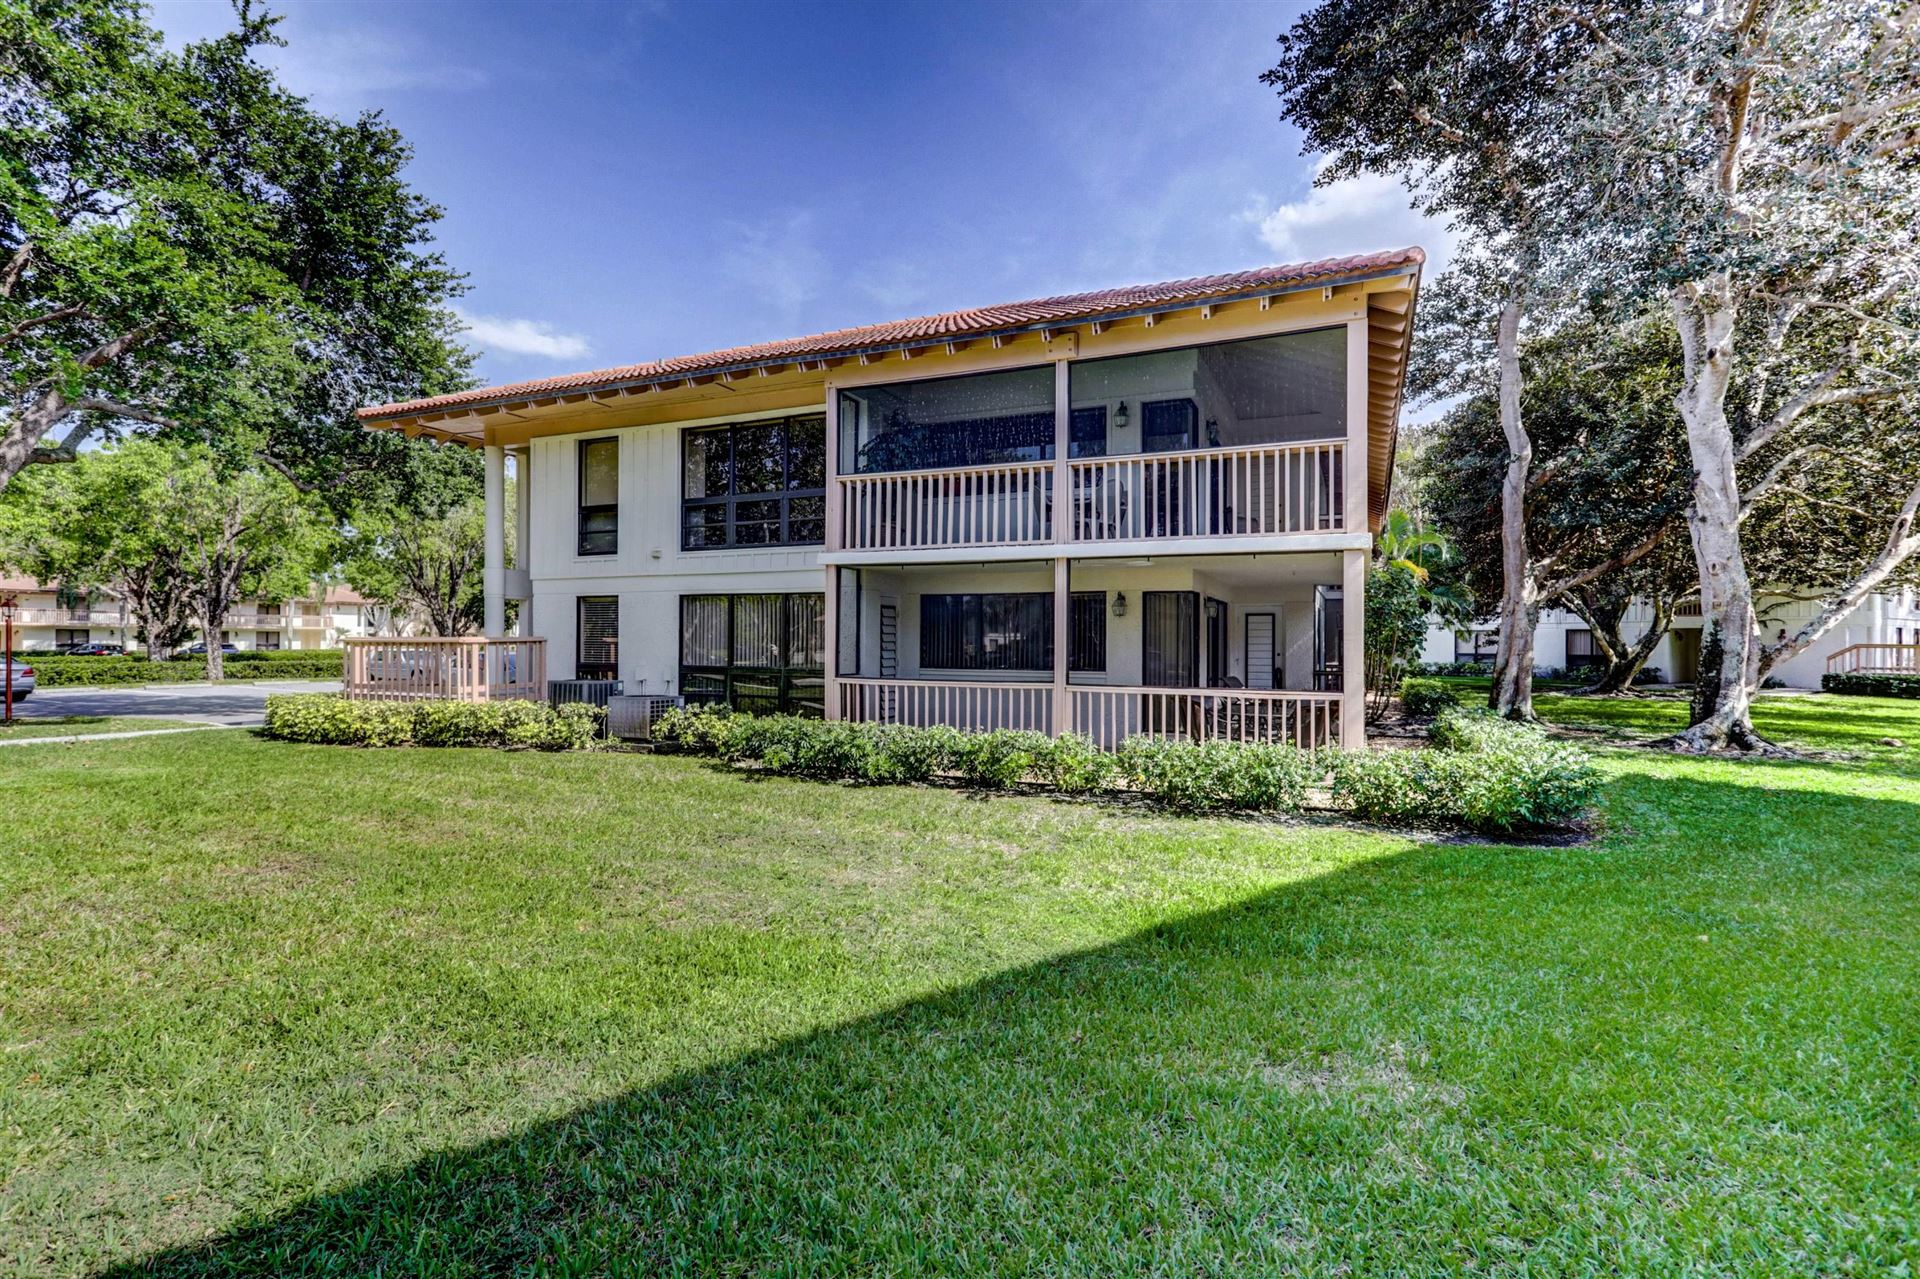 Photo of 130 Brackenwood Road, Palm Beach Gardens, FL 33418 (MLS # RX-10708140)